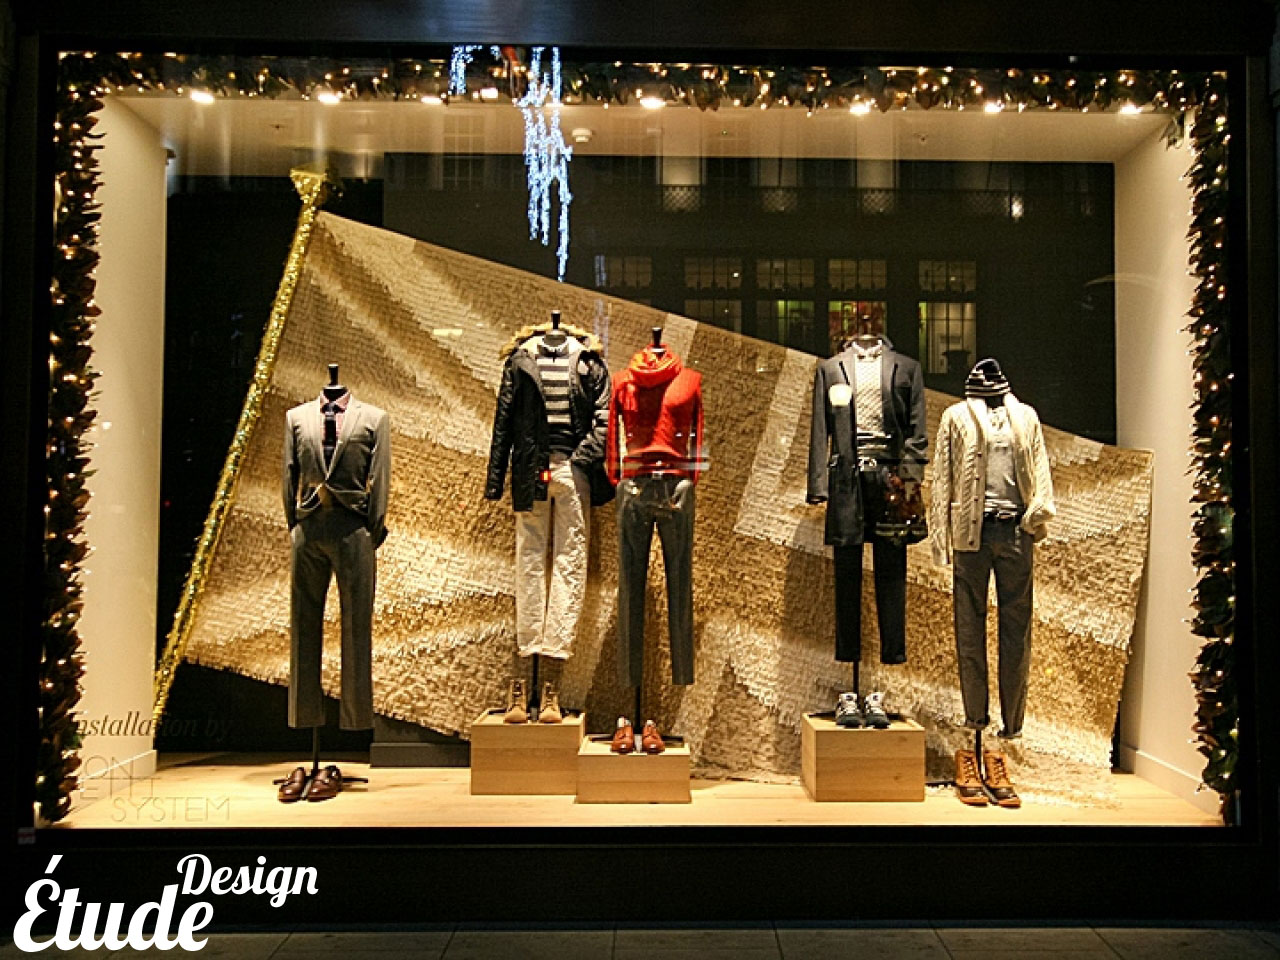 christmas-shop-window-display-best-christmas-window-displays-9aedeefc9cceec51